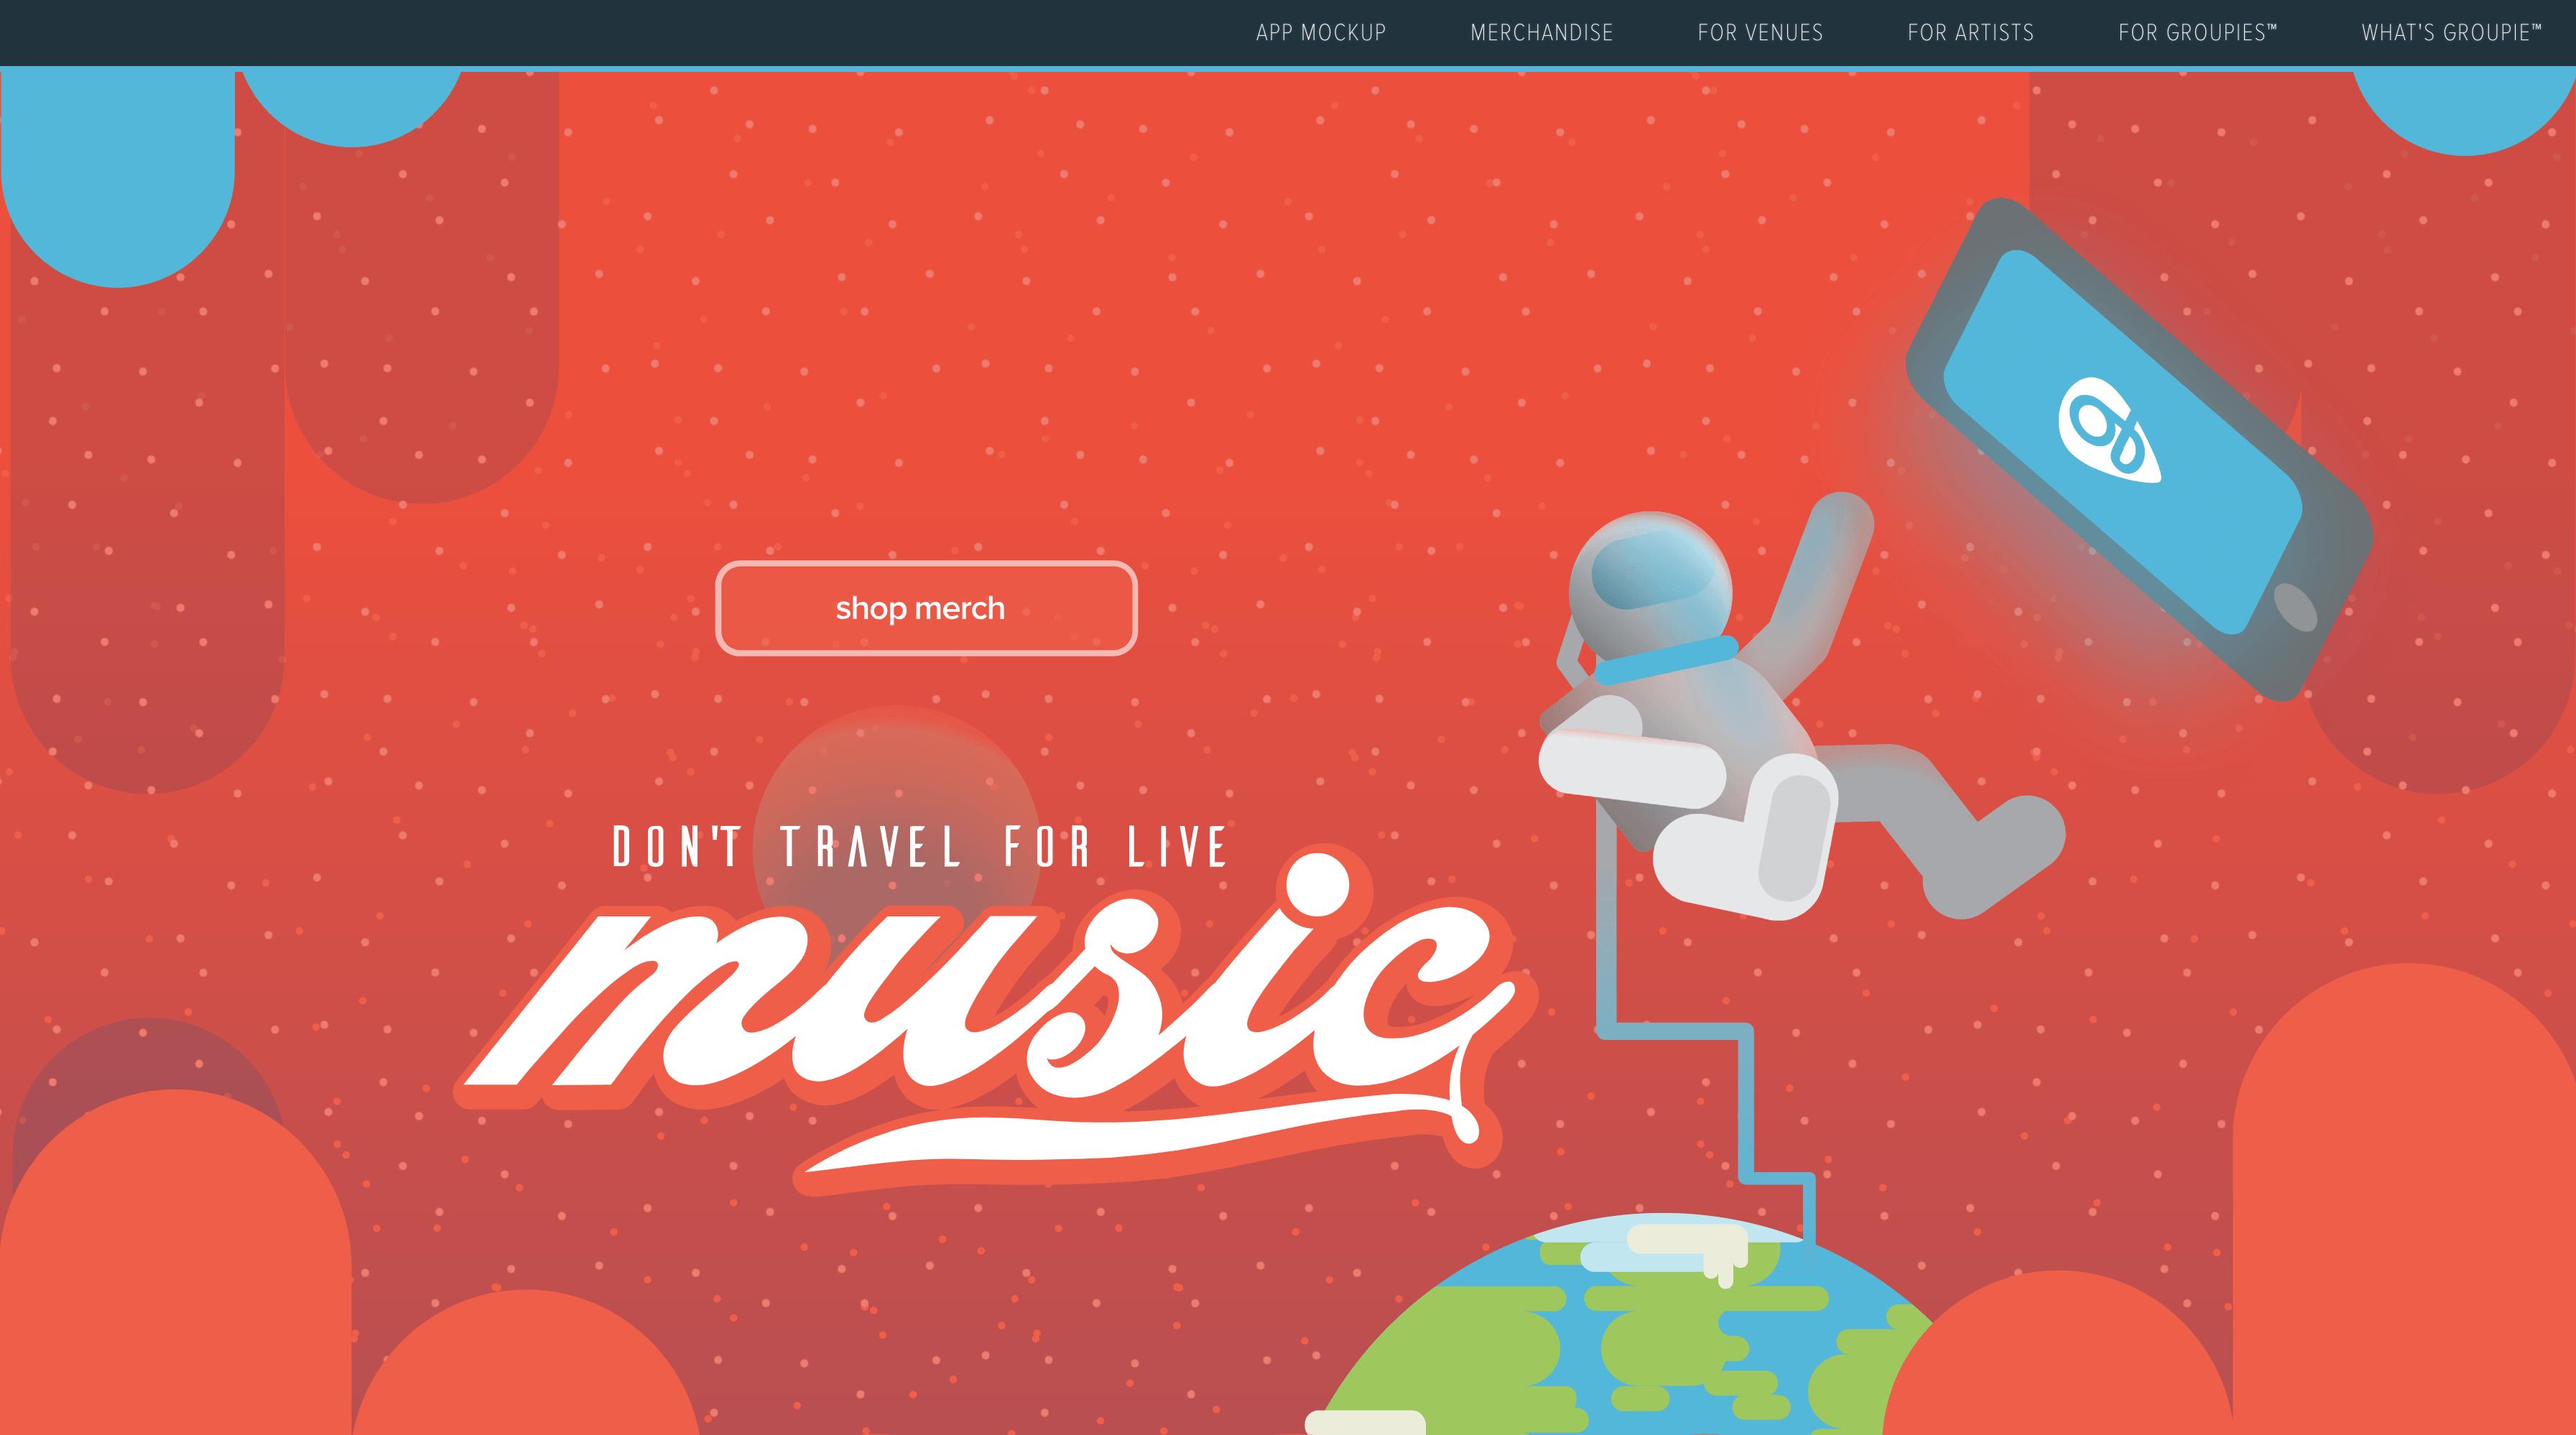 dustin-keeslar-portfolio-website-groupie-live3